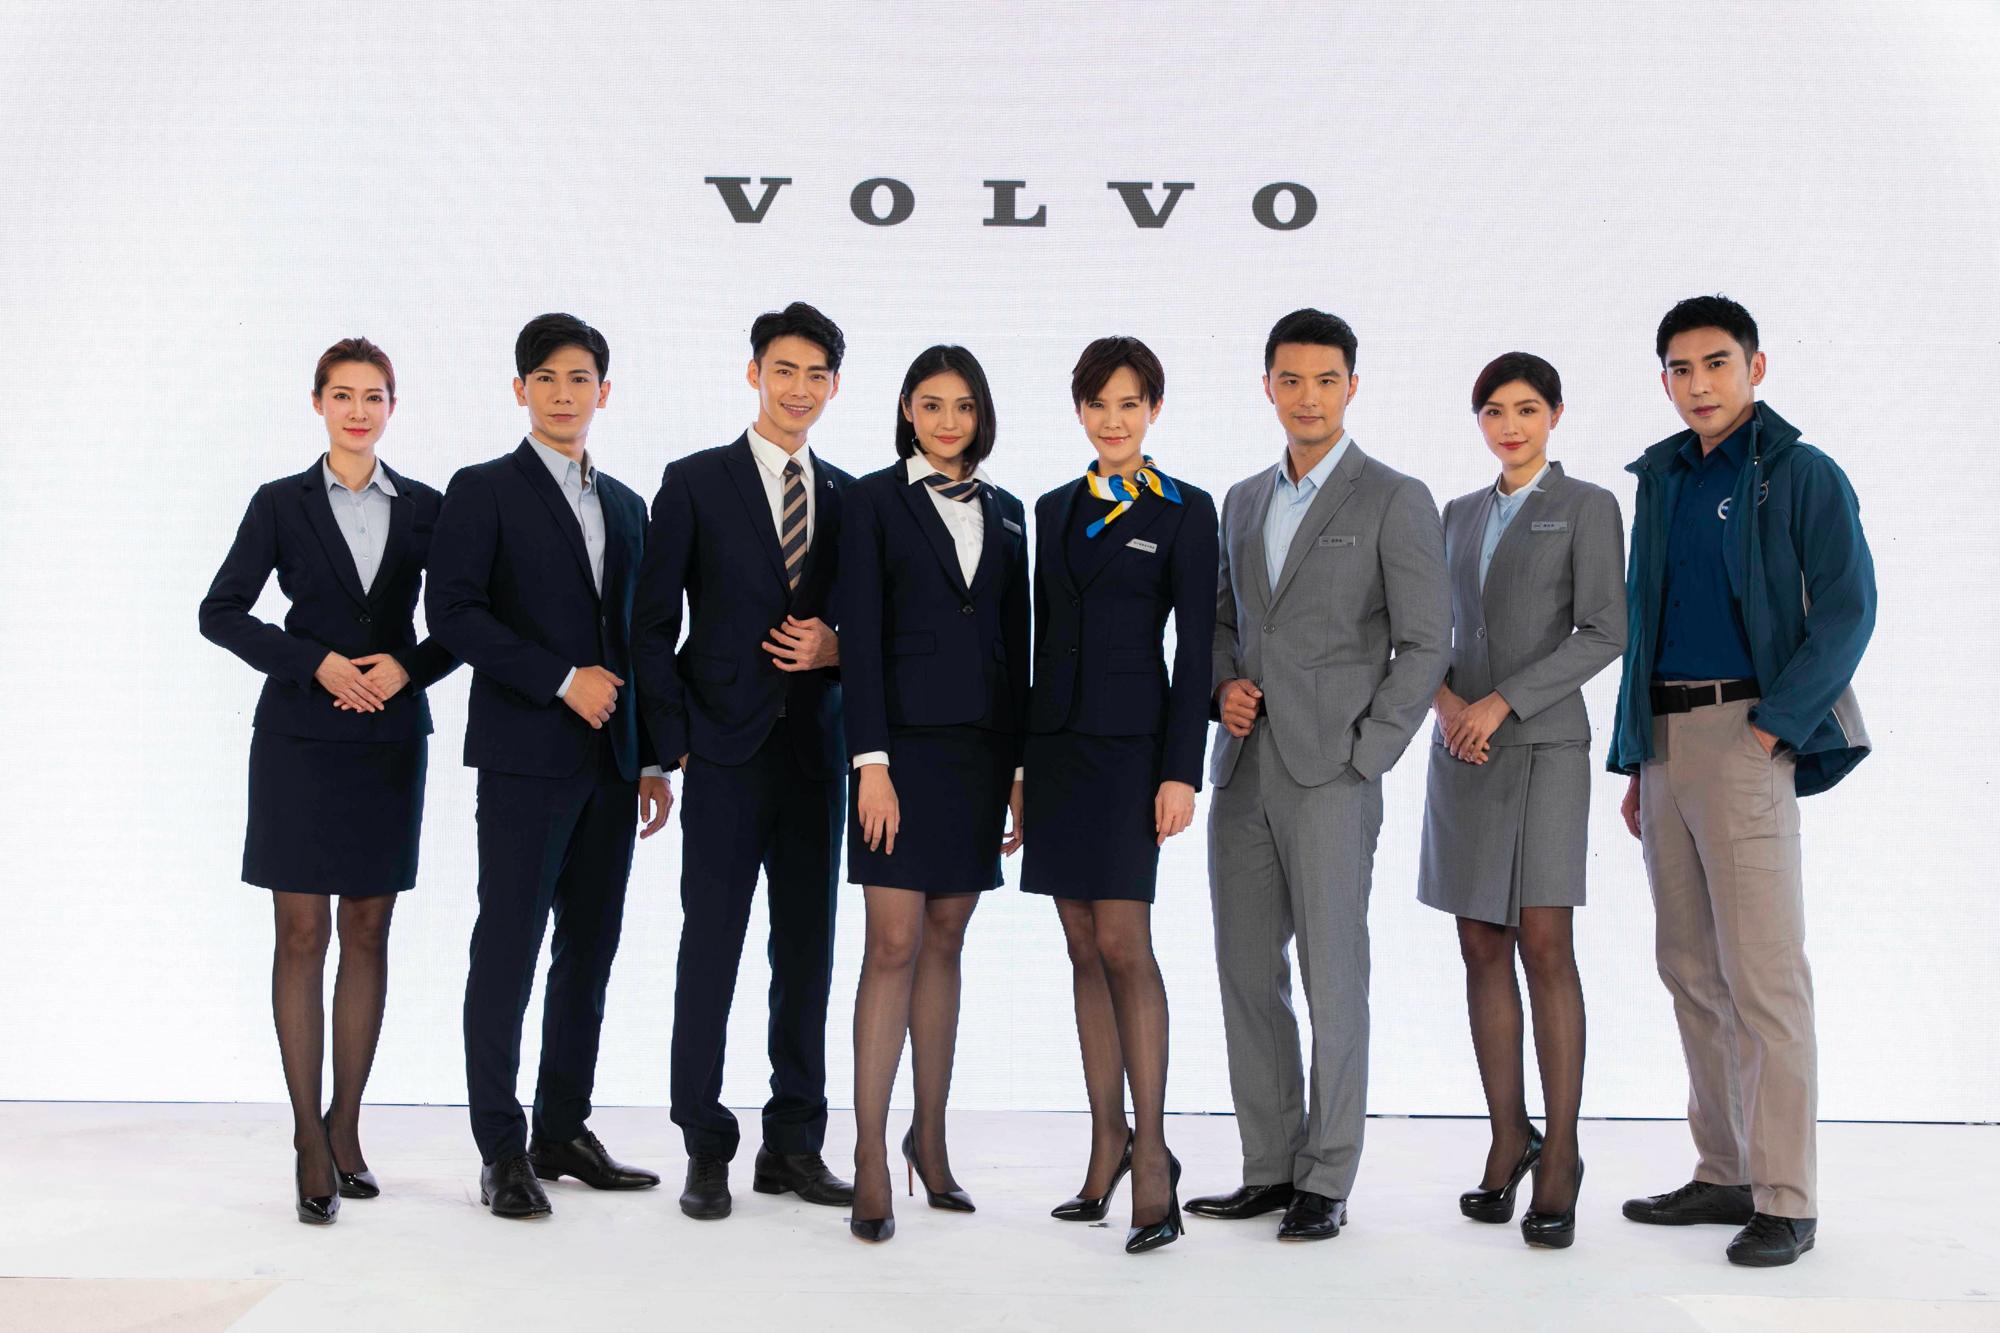 Volvo 宣佈全面升級改款工作人員制服,特別邀請凱渥名模演繹北歐時尚風情。